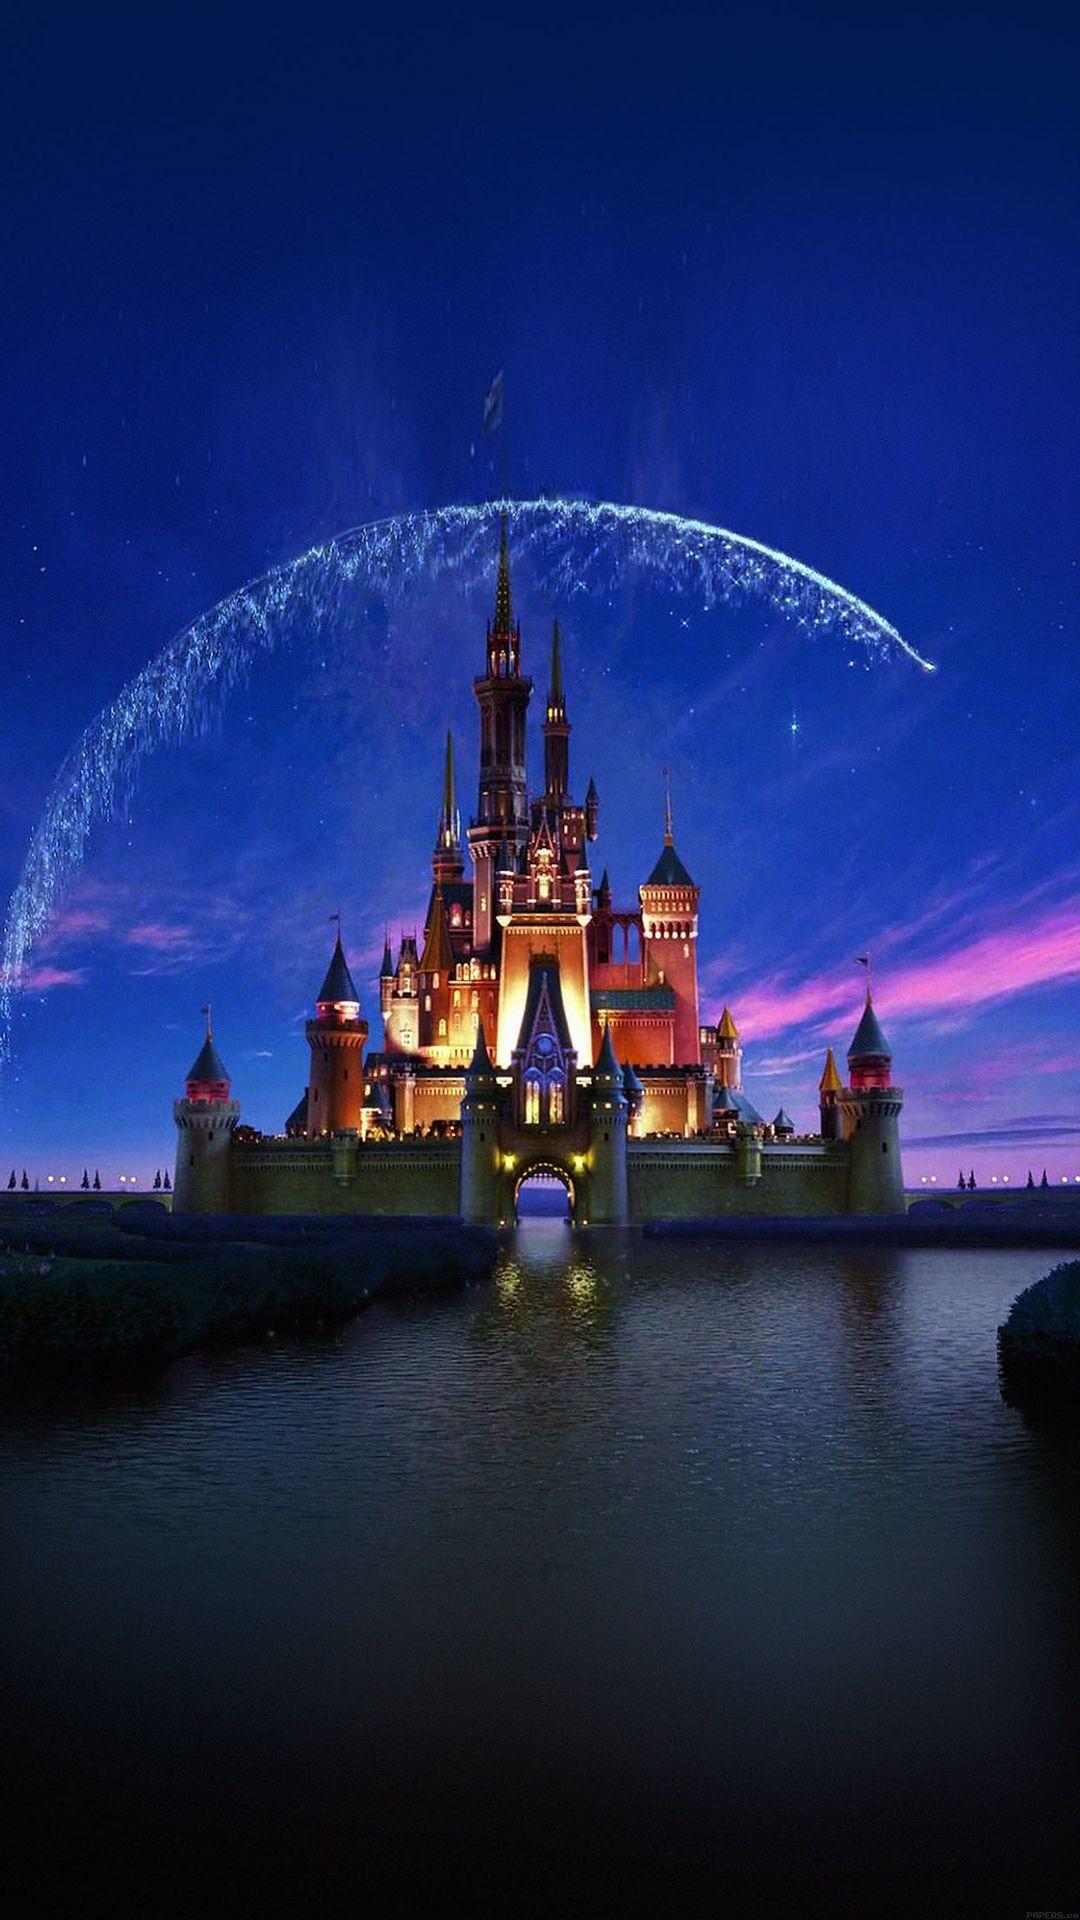 Tap image for more iPhone Disney wallpaper! Disney castle artwork –  @mobile9   Wallpapers